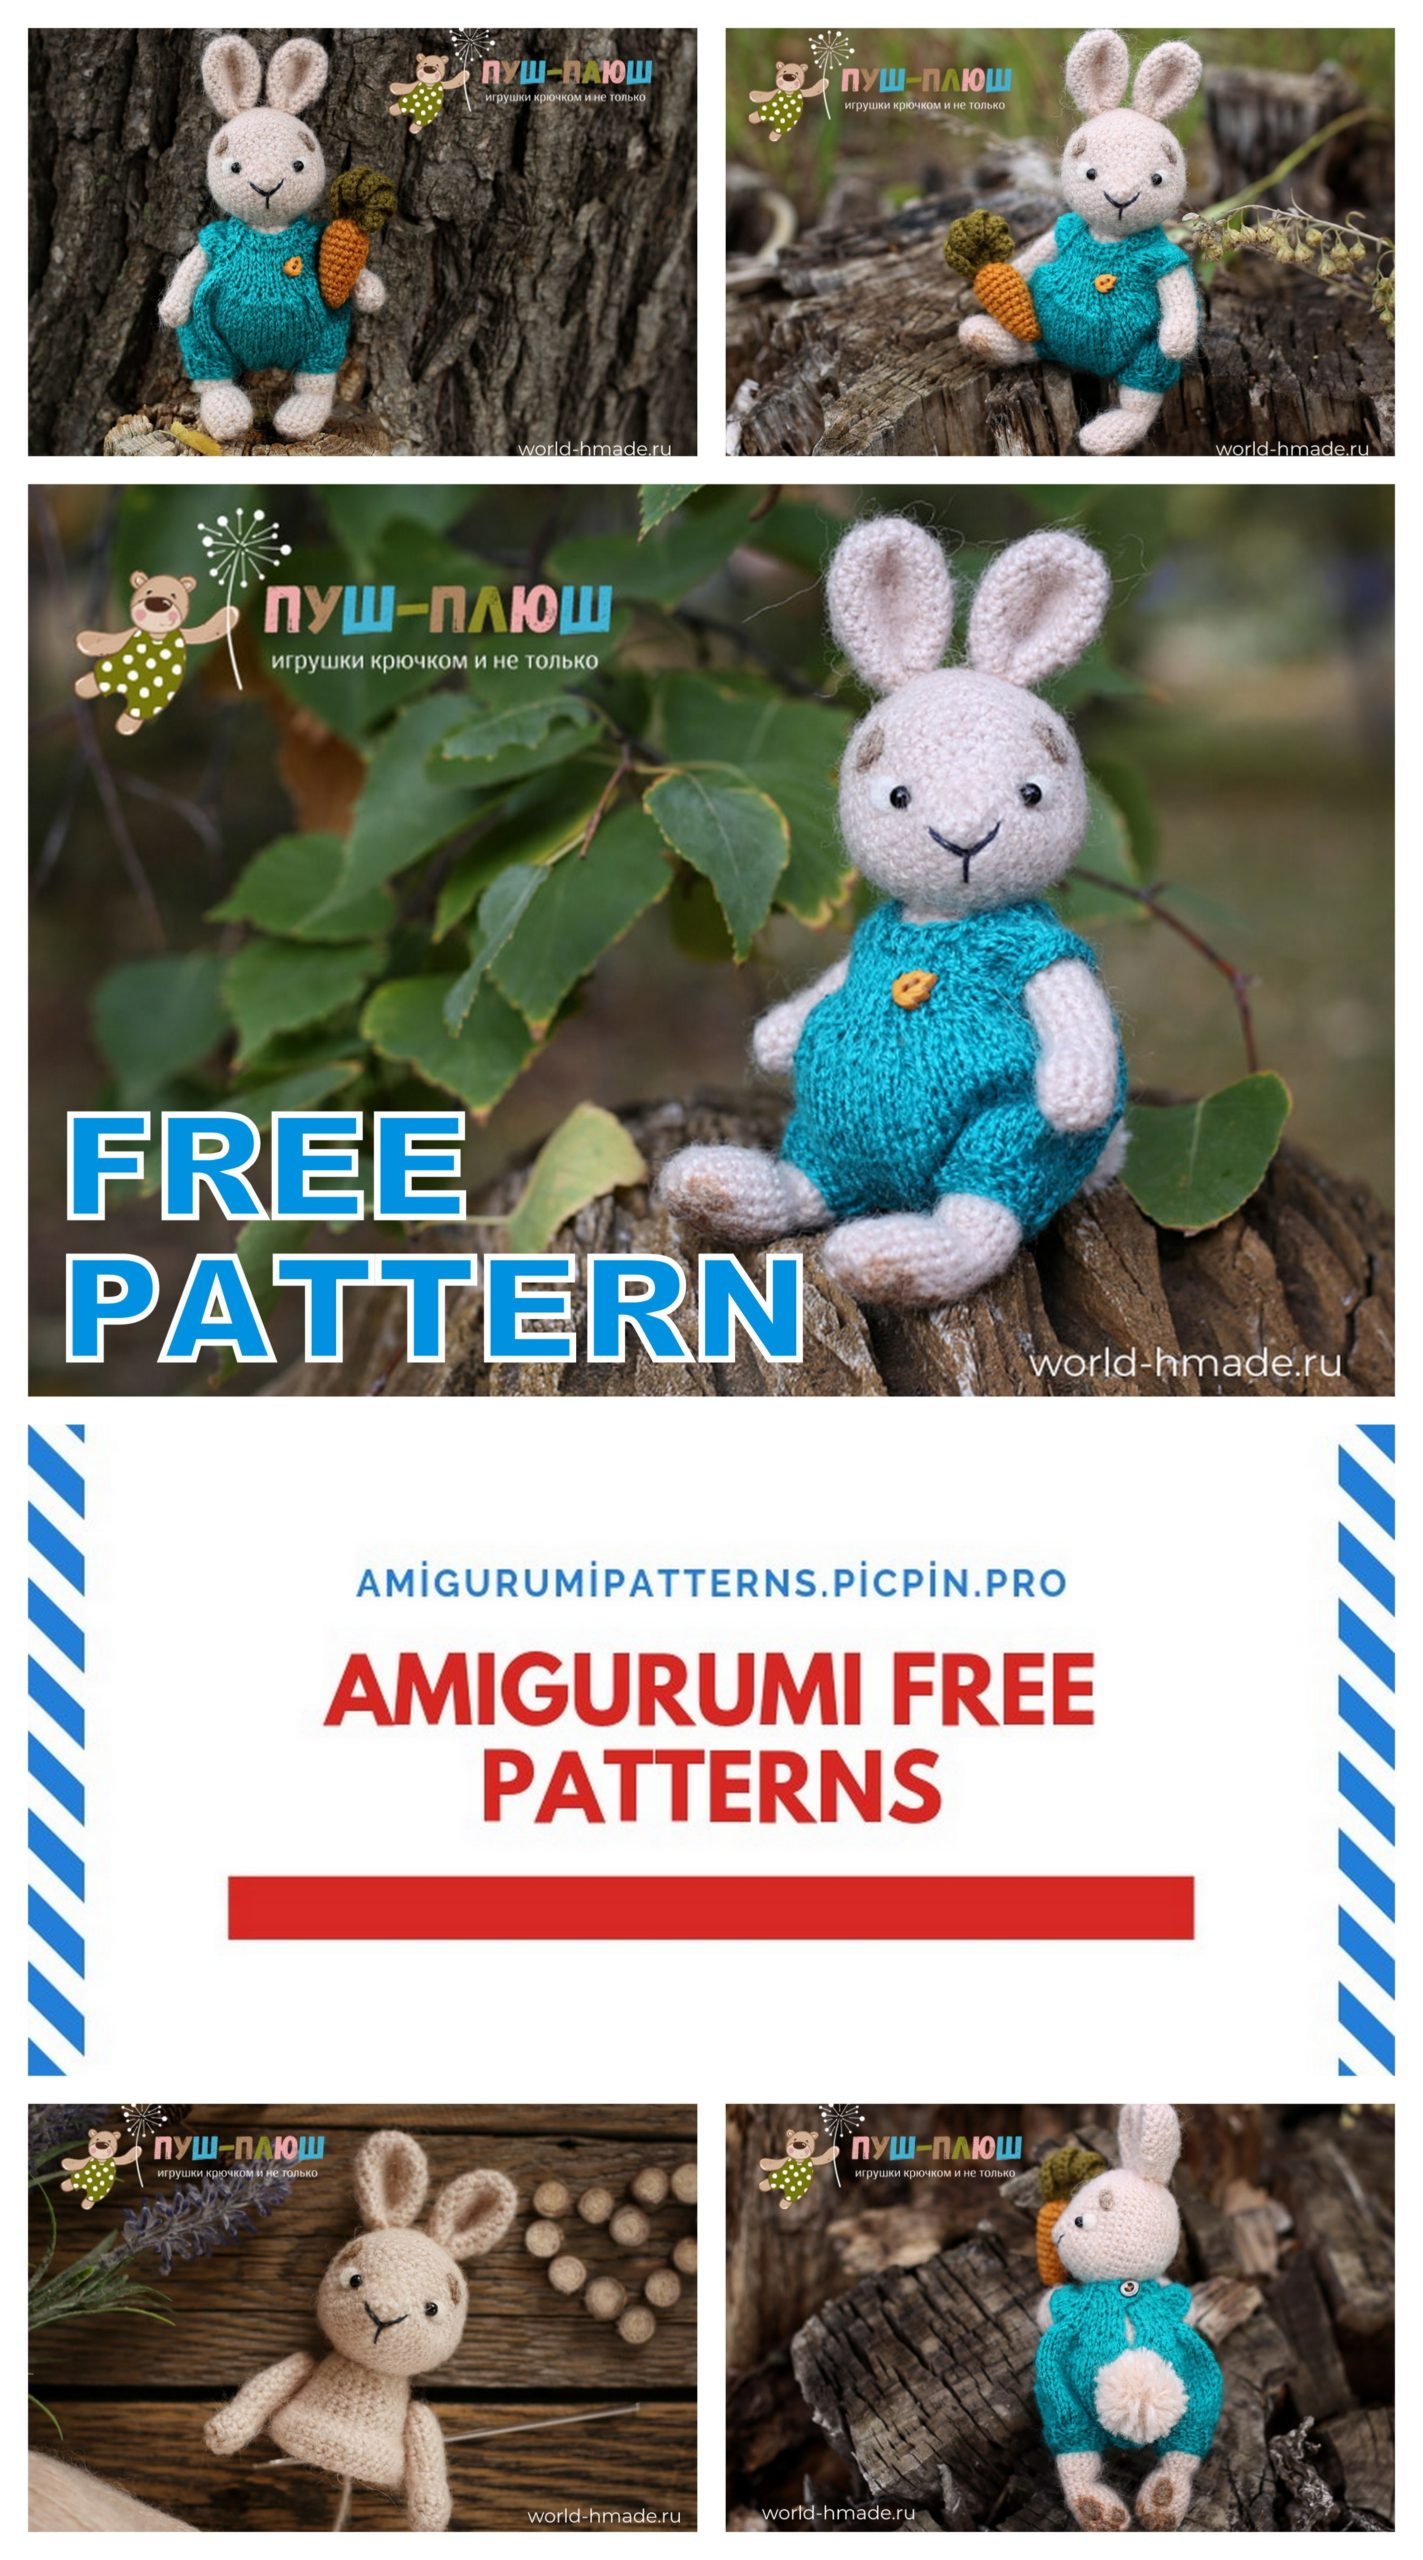 Amigurumi Today - Free amigurumi patterns and amigurumi tutorials | 2560x1423